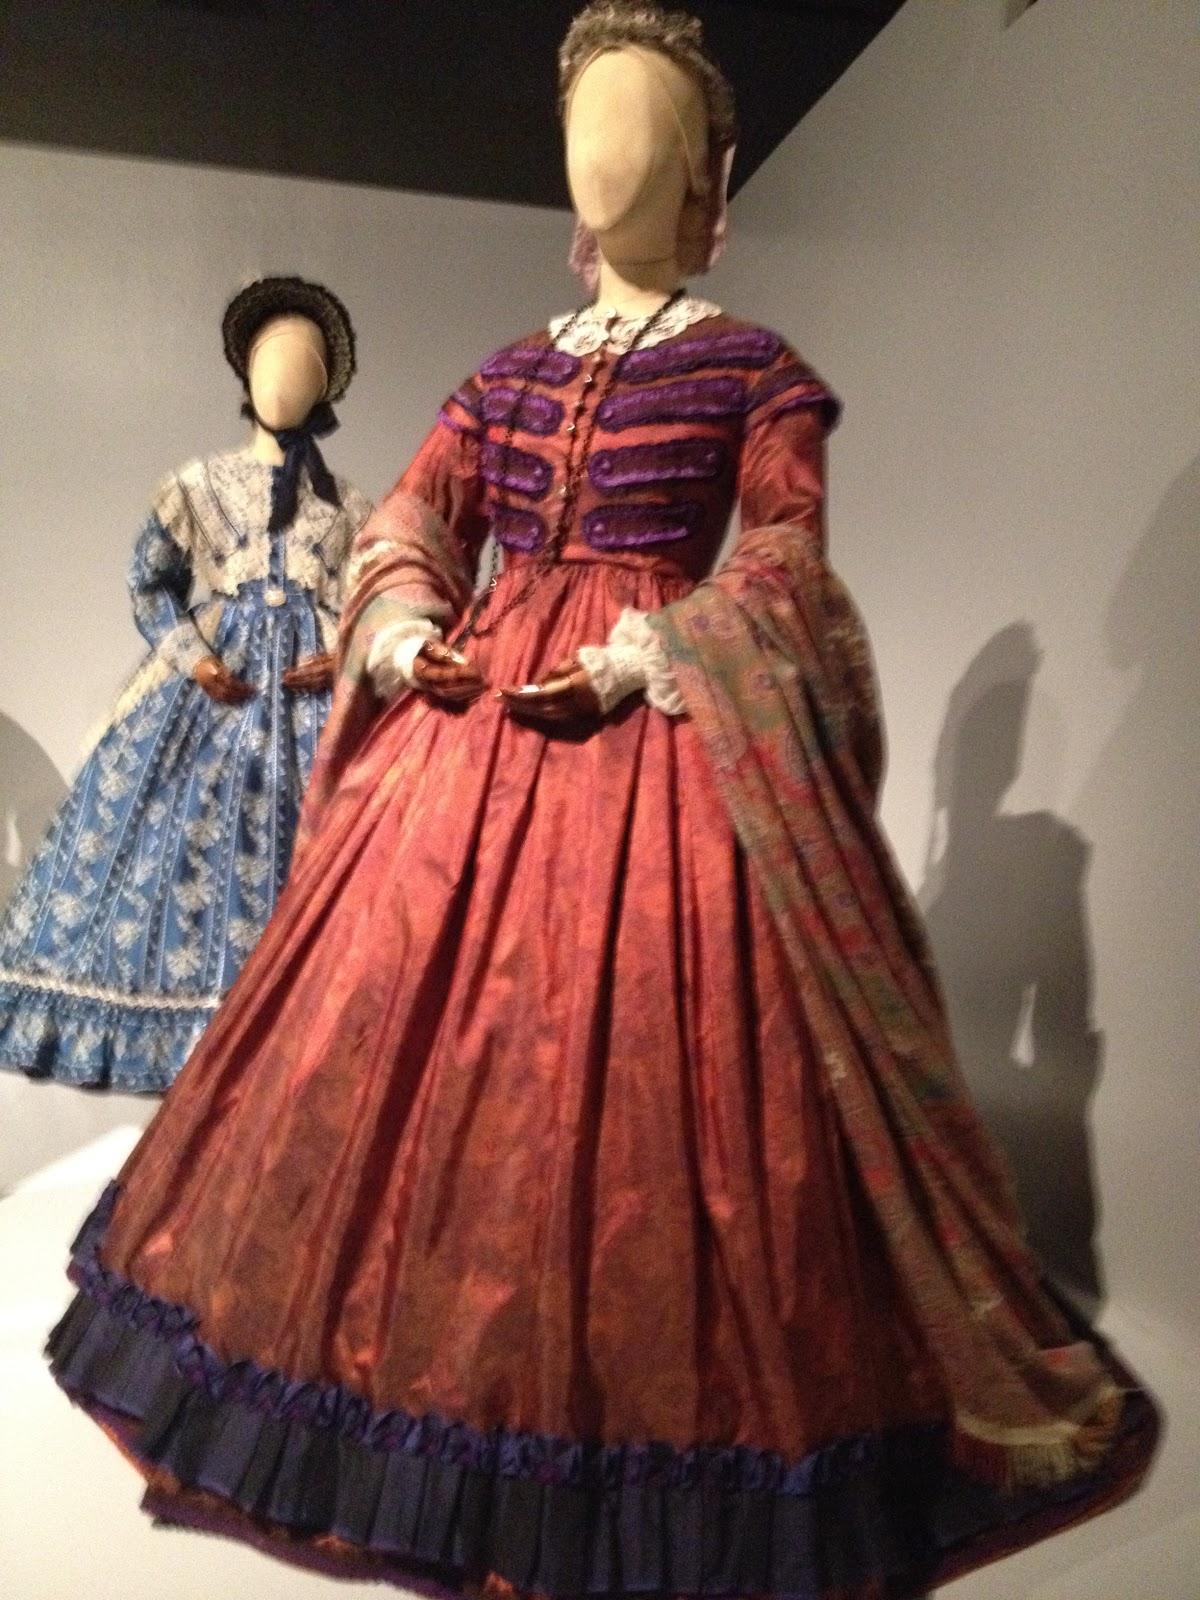 The Seamstress of Avalon: A Night of Movie Fashion